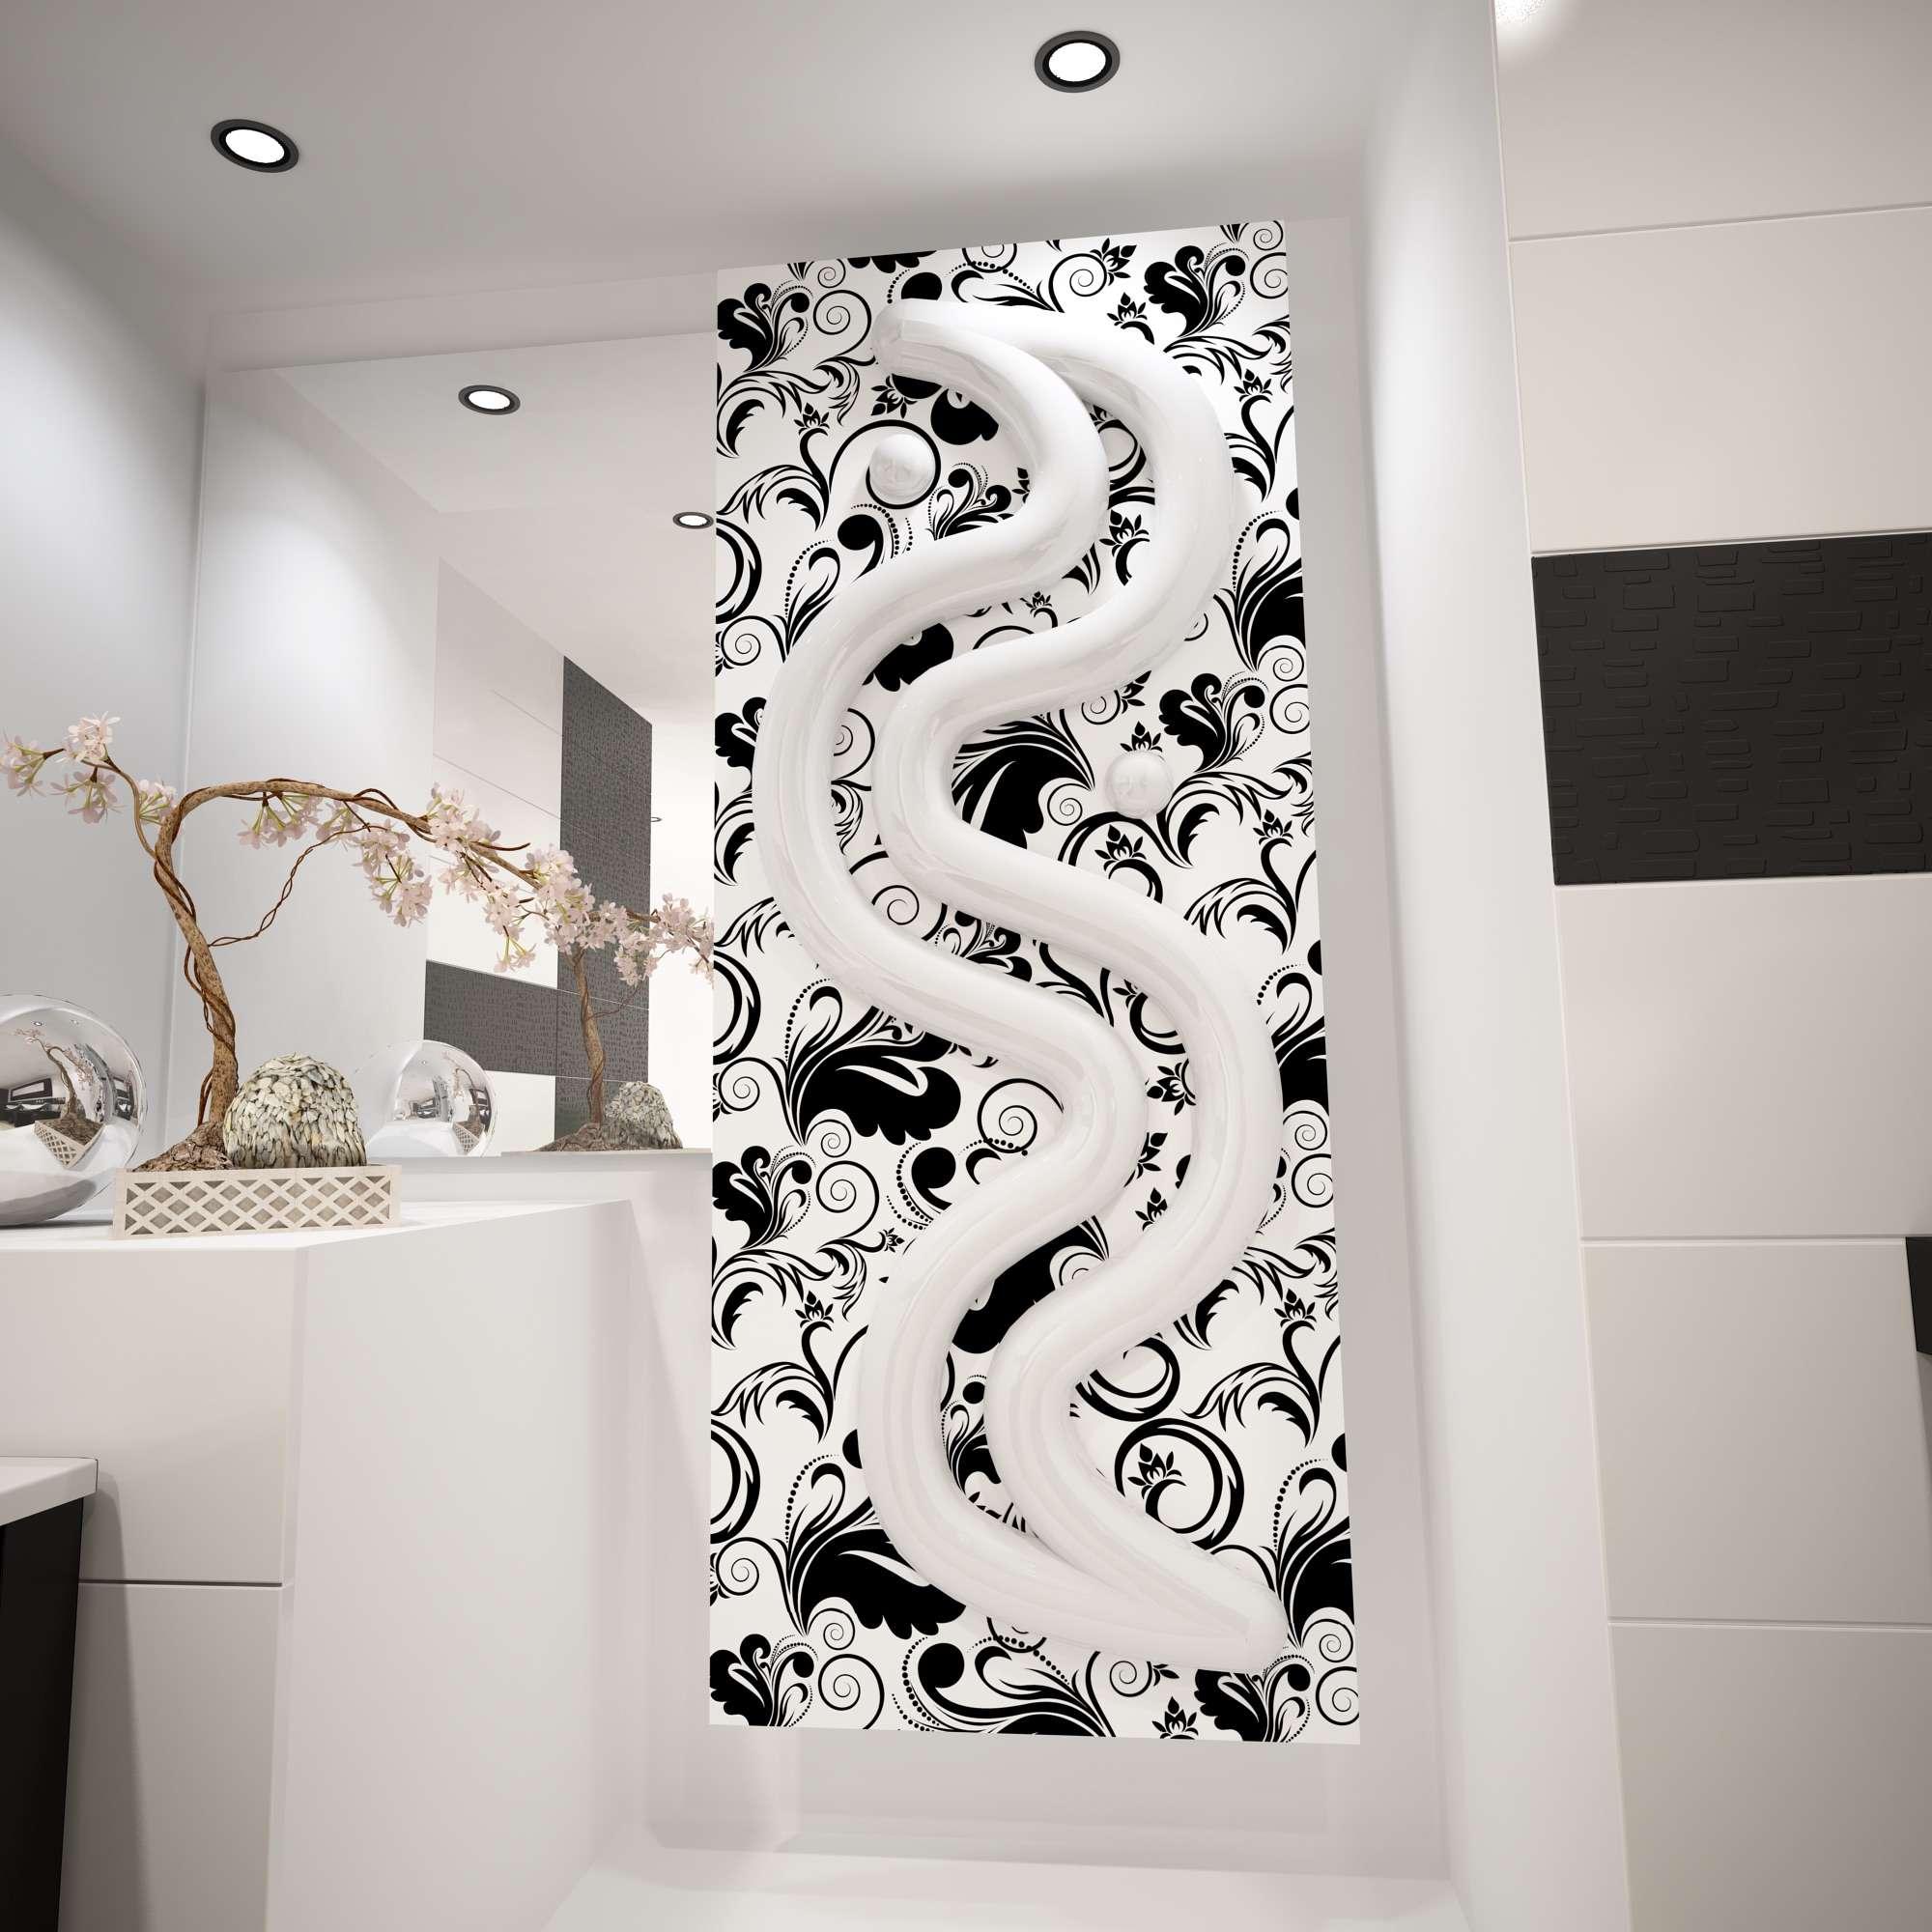 radiator, design, made in italy, bathroom